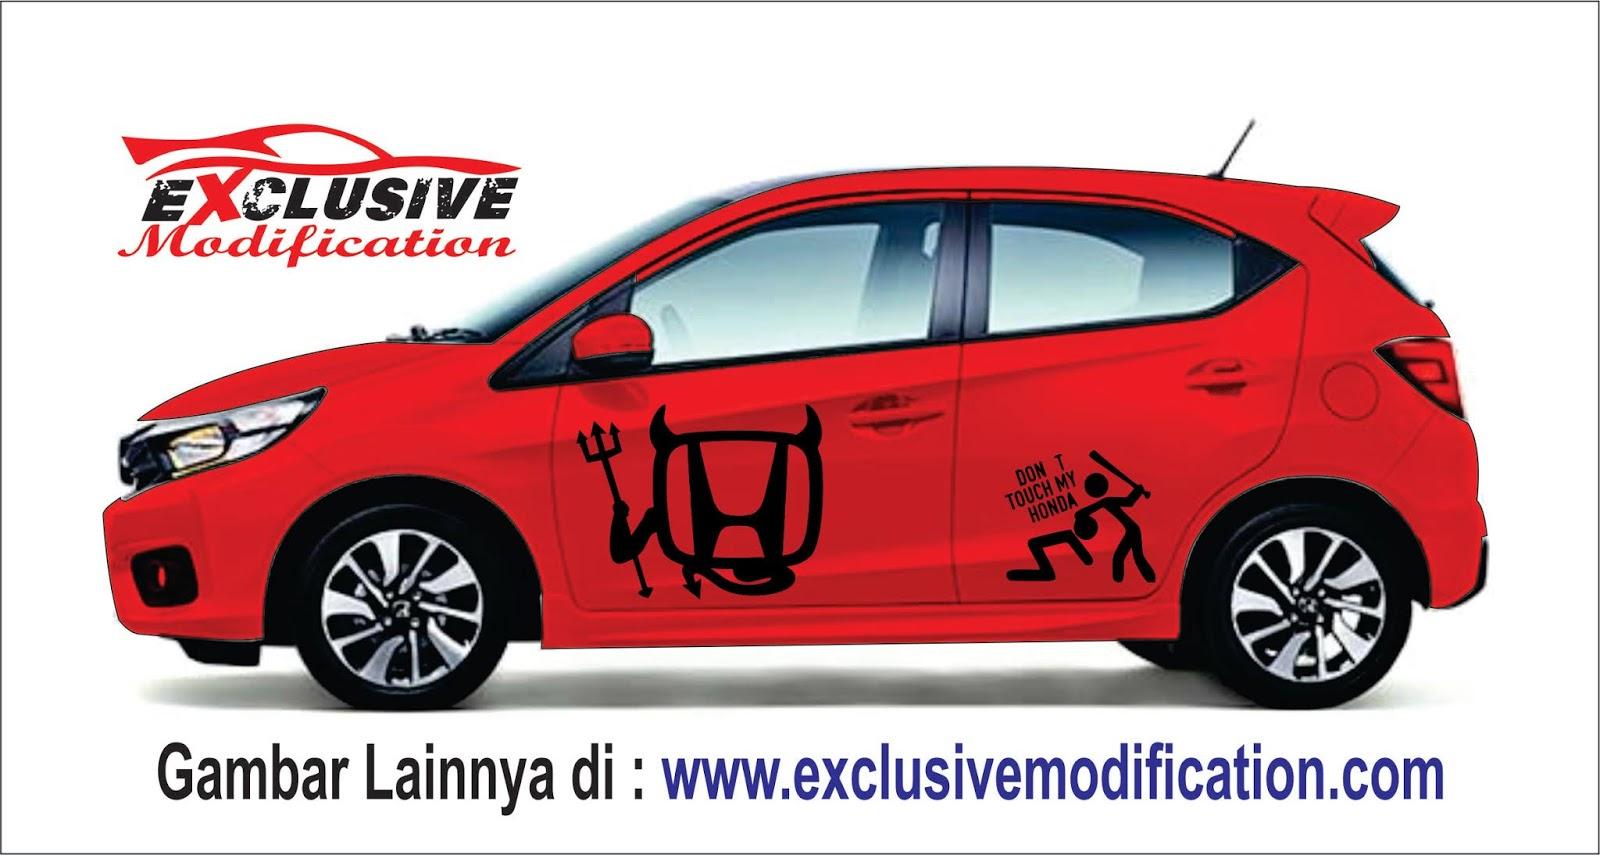 Modifikasi Motif Cutting Sticker Mobil Datsun Go 2019 Retromodif